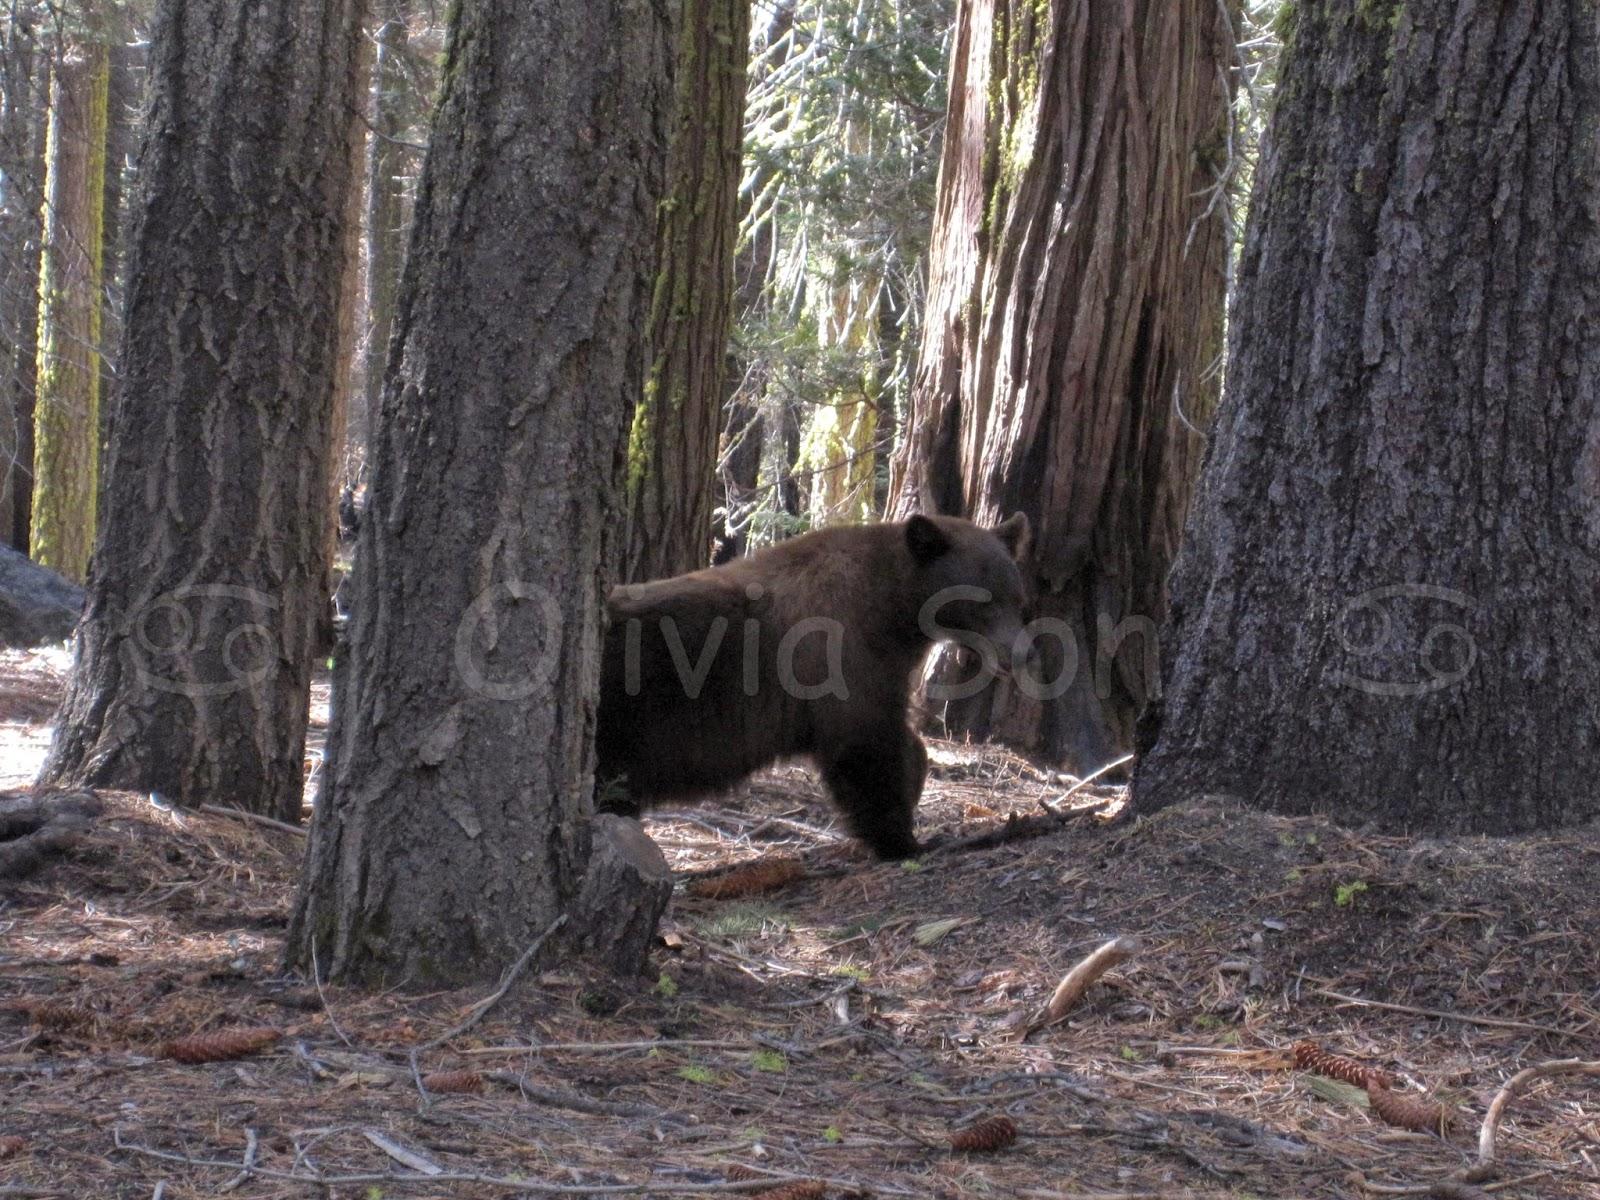 ours Yosemite National Park, California, USA